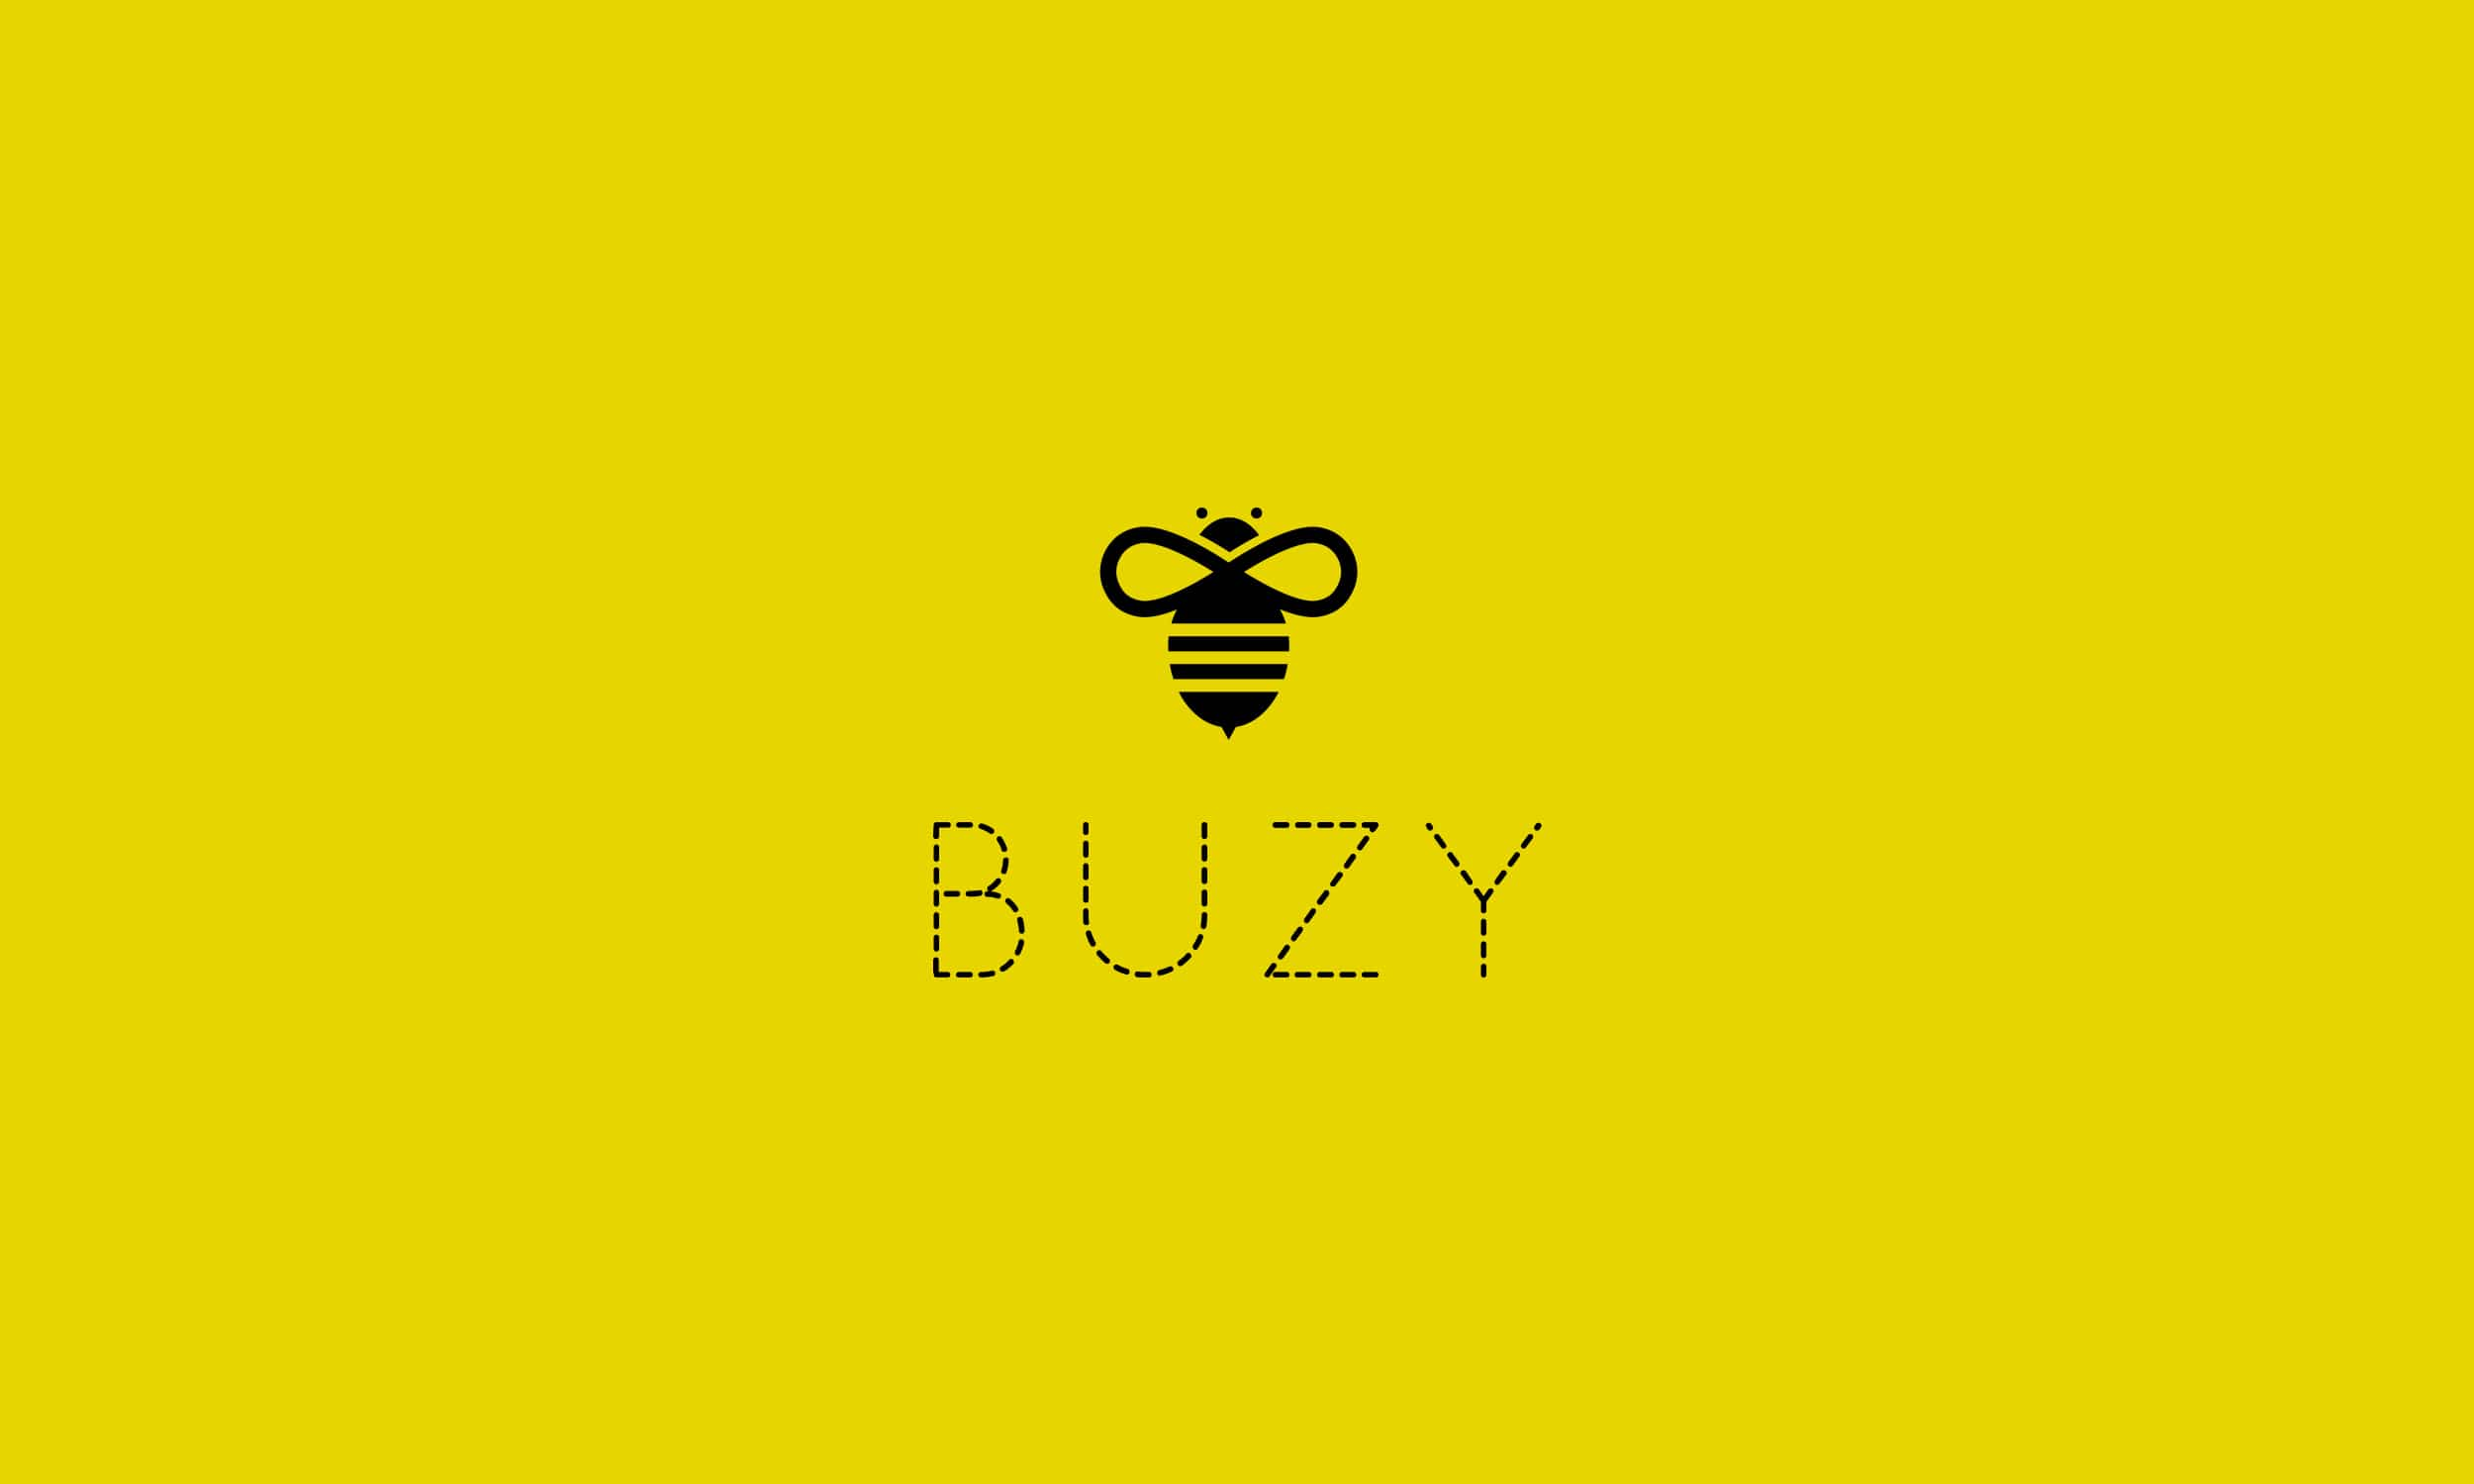 hdr-logo-template-buzy.jpg